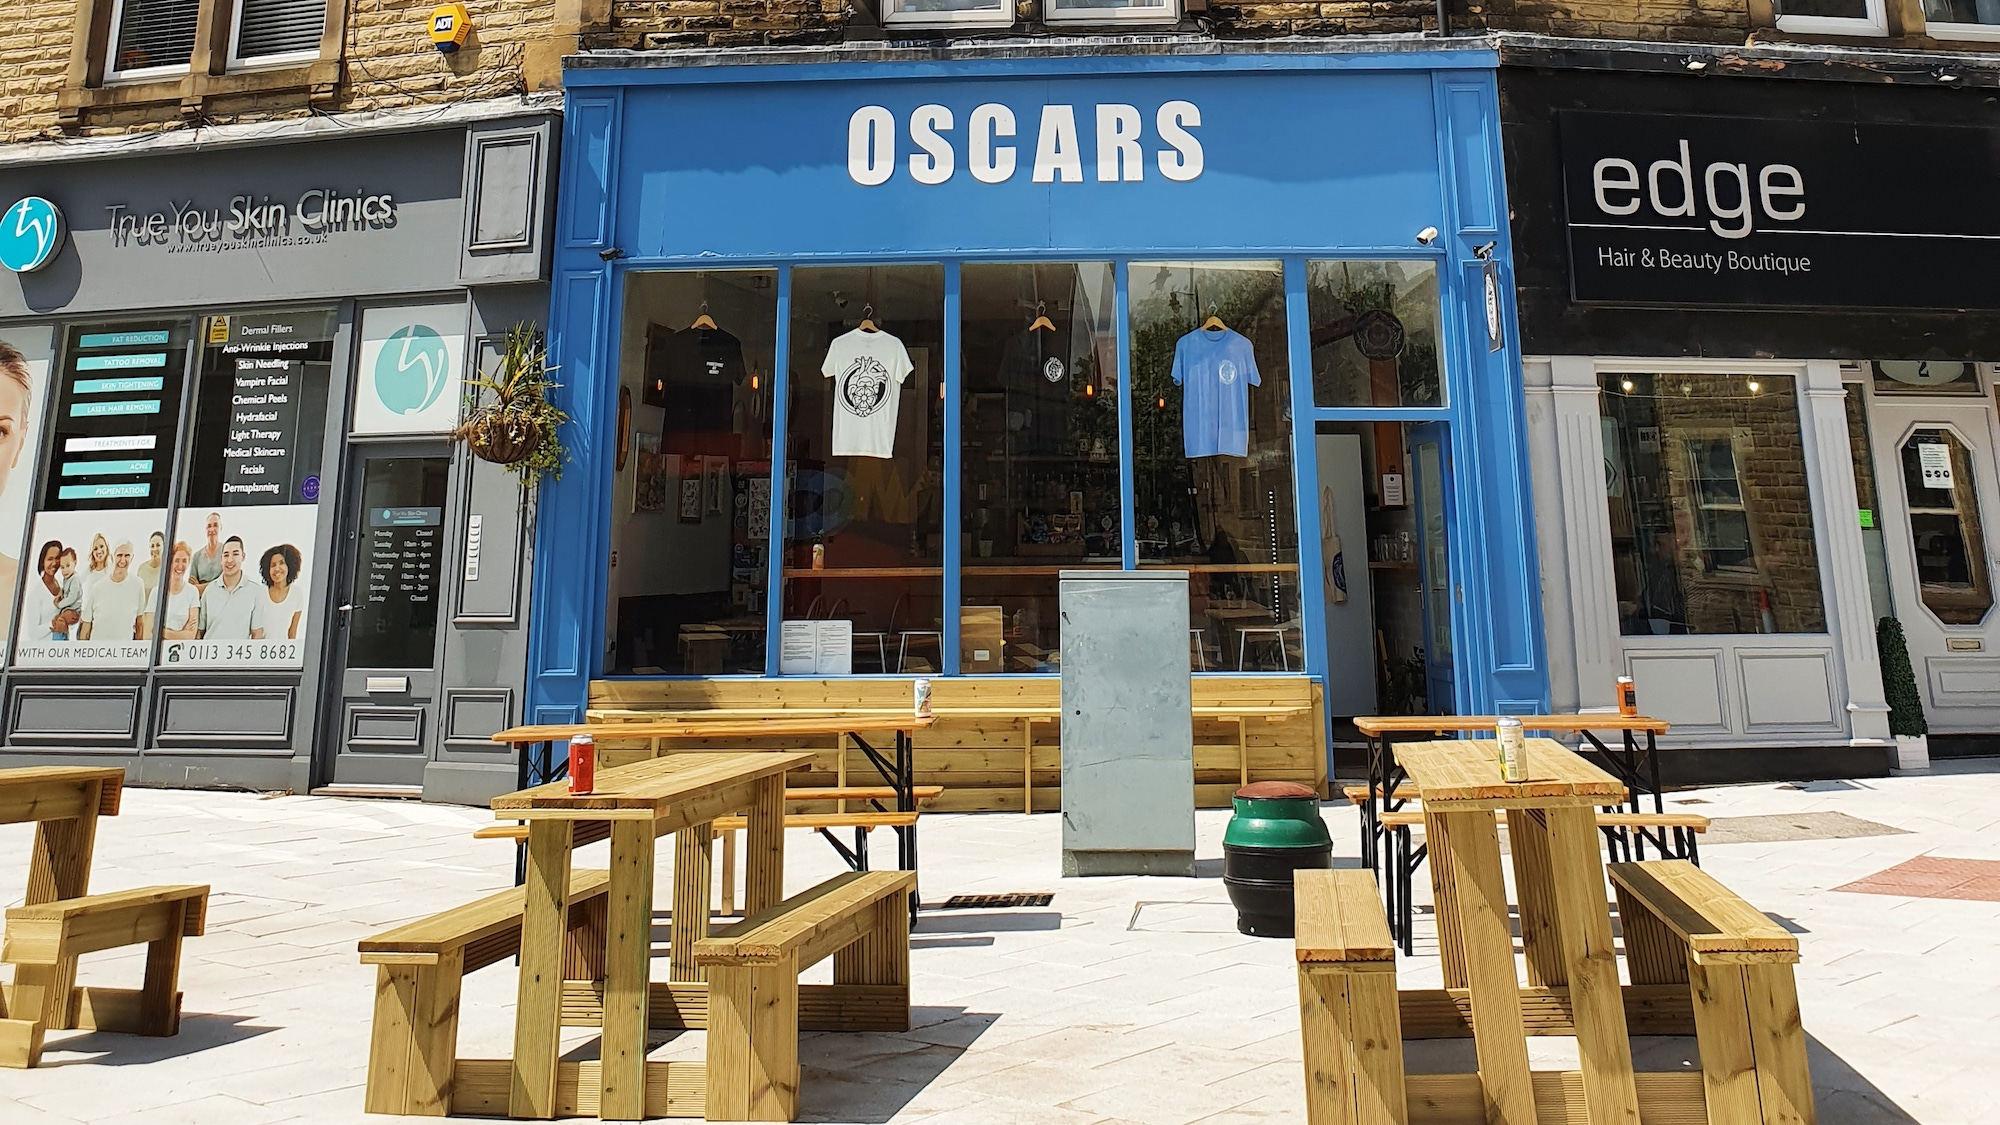 Oscar's Morley